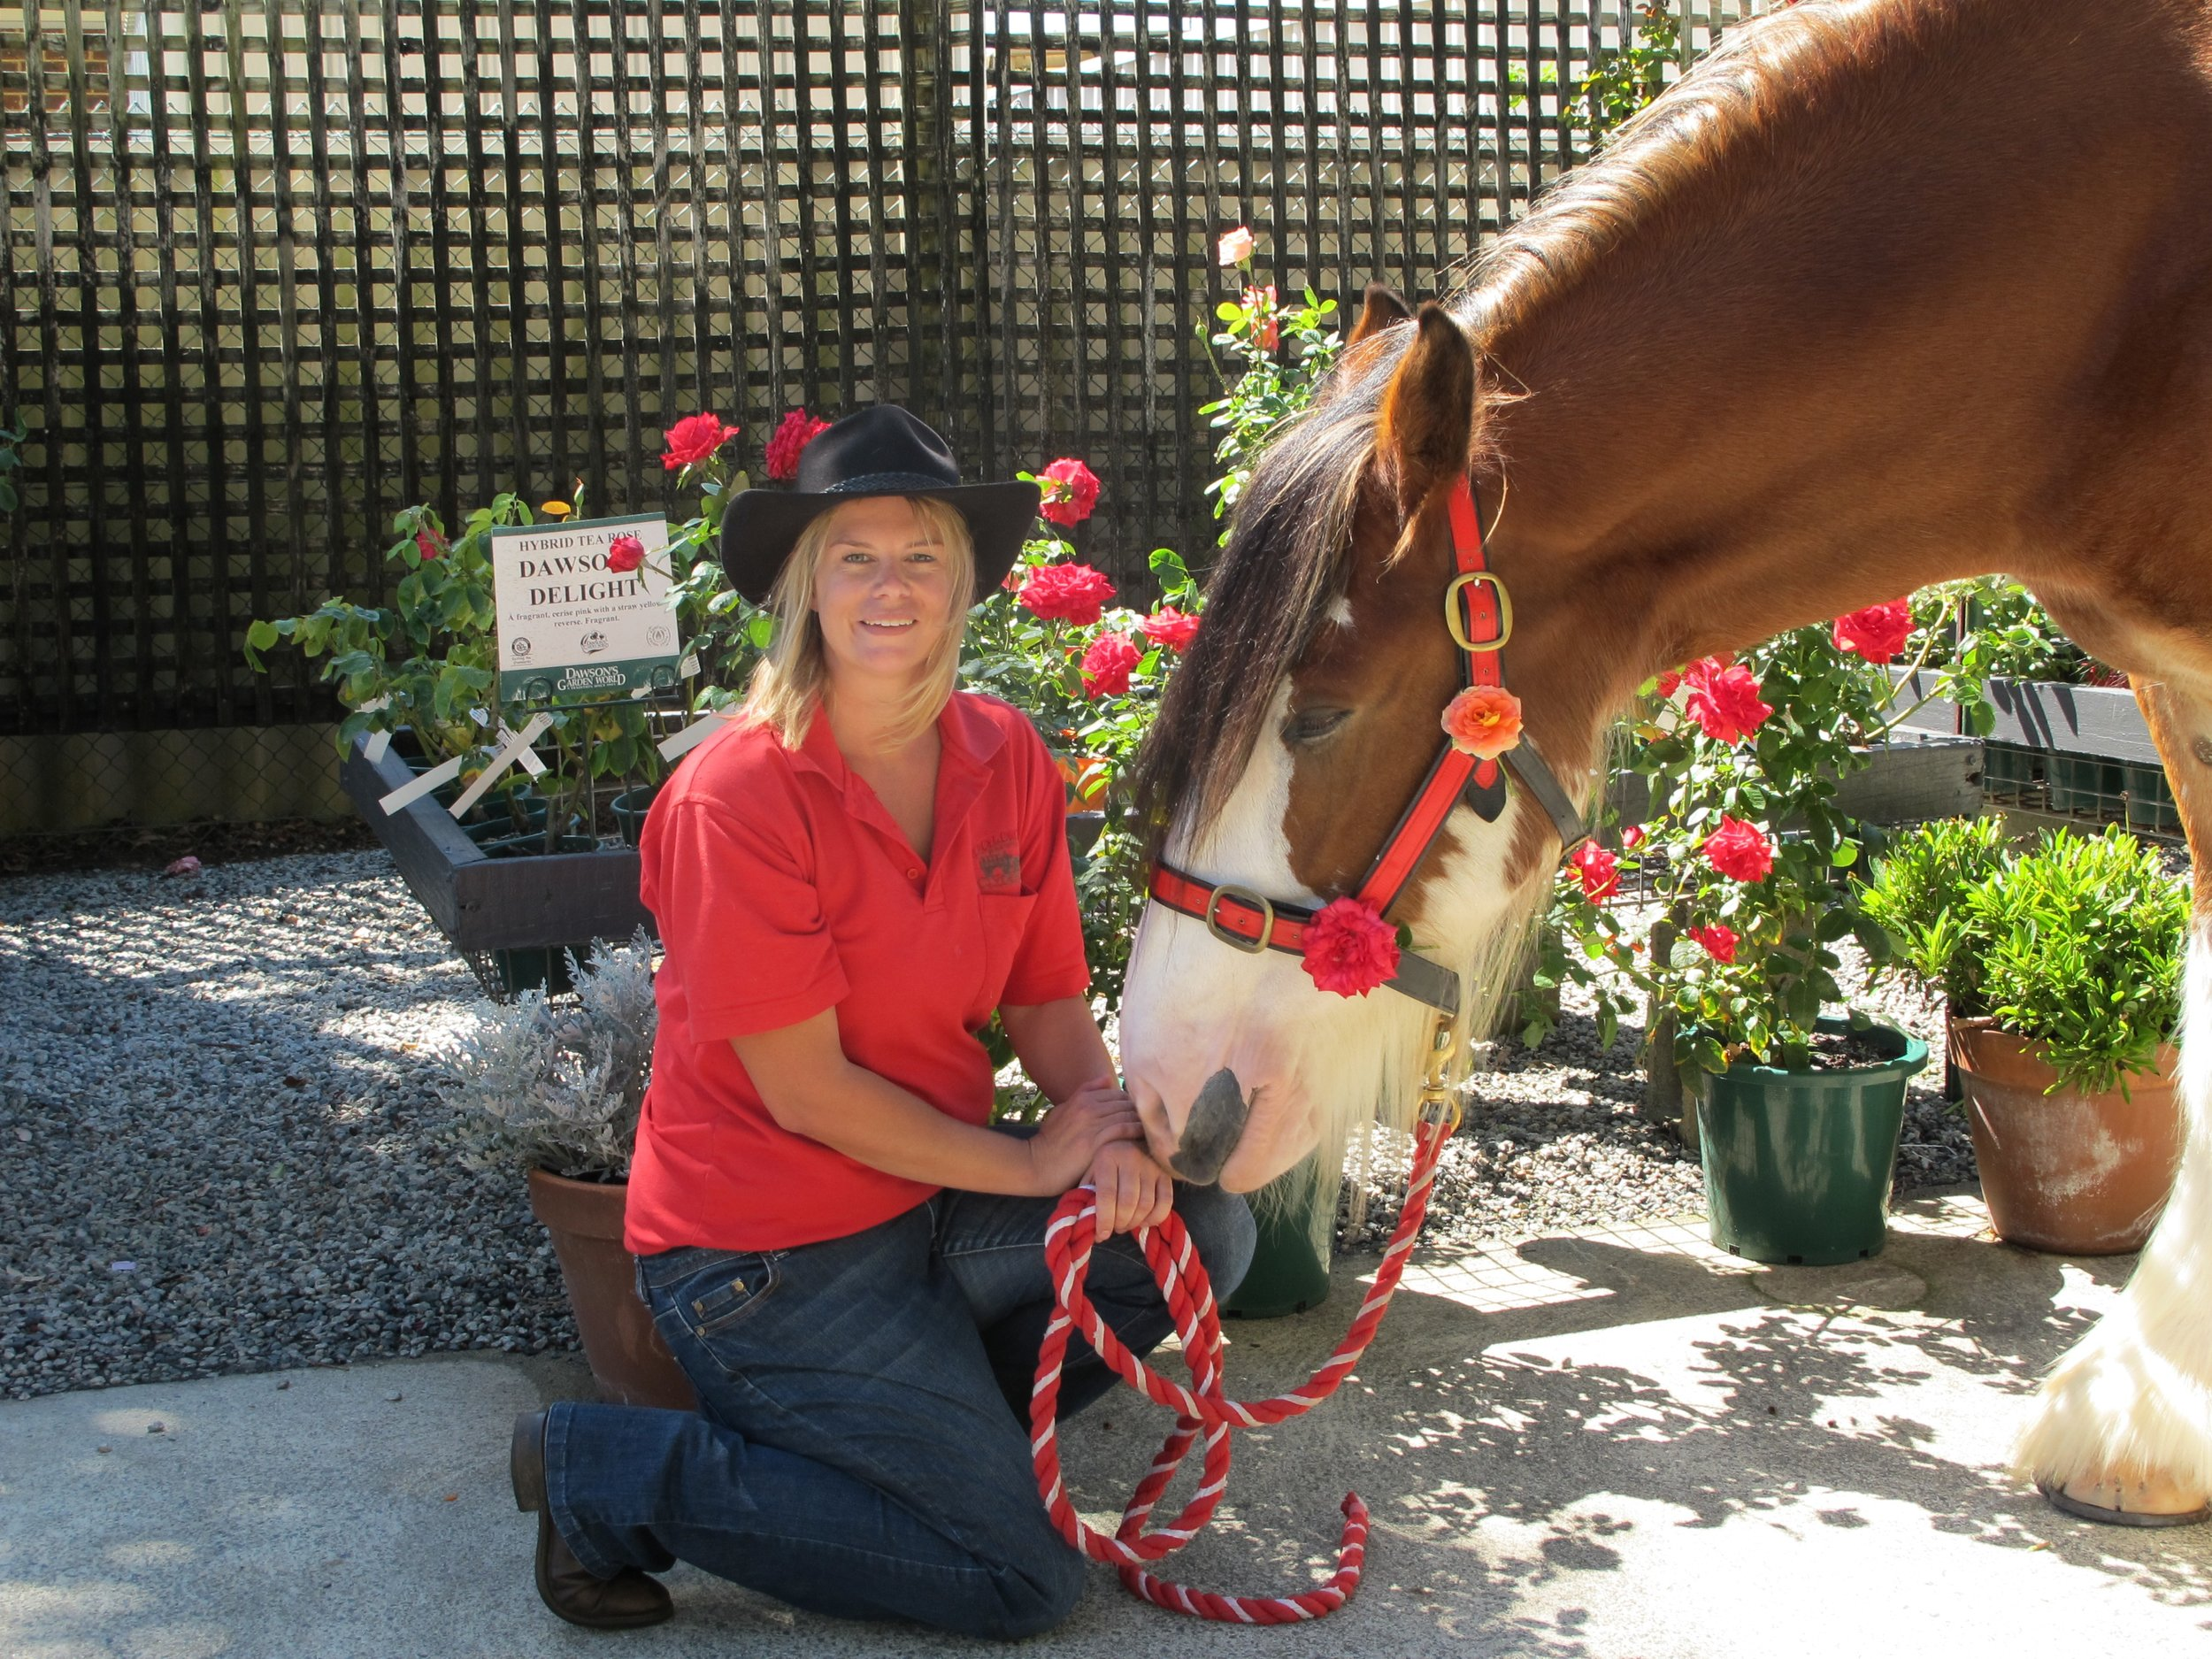 Garden week Horses 131 - Promotions.JPG